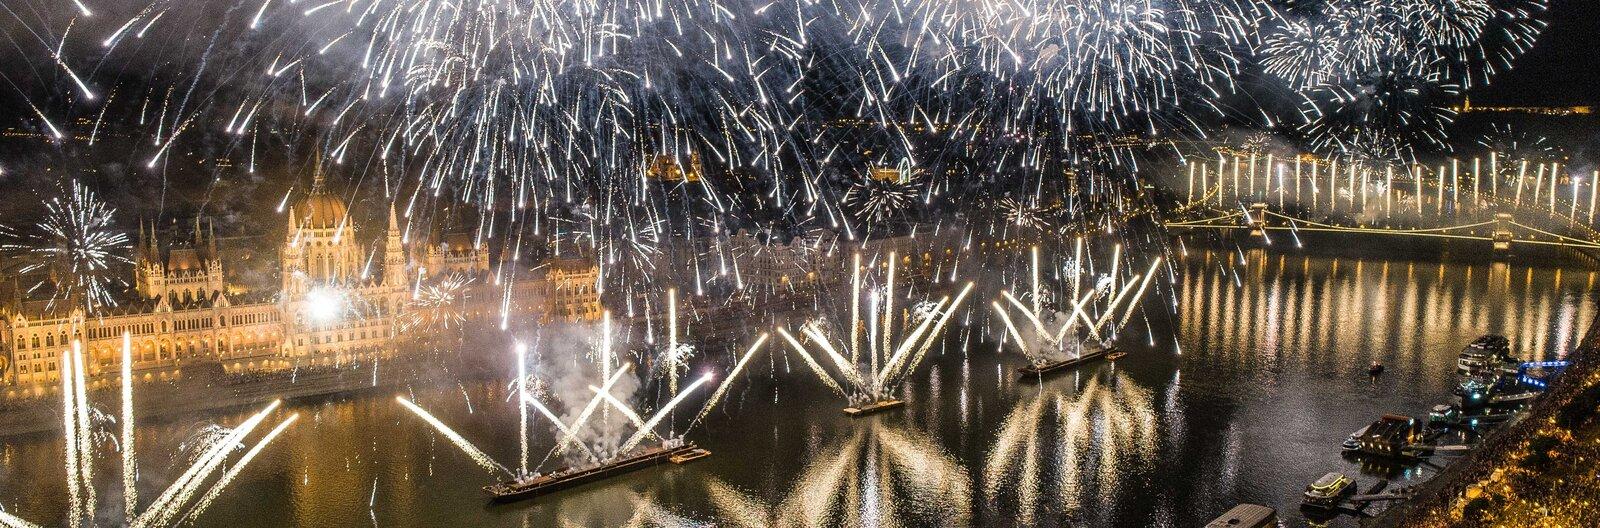 2019 calendar of Budapest festivals and events